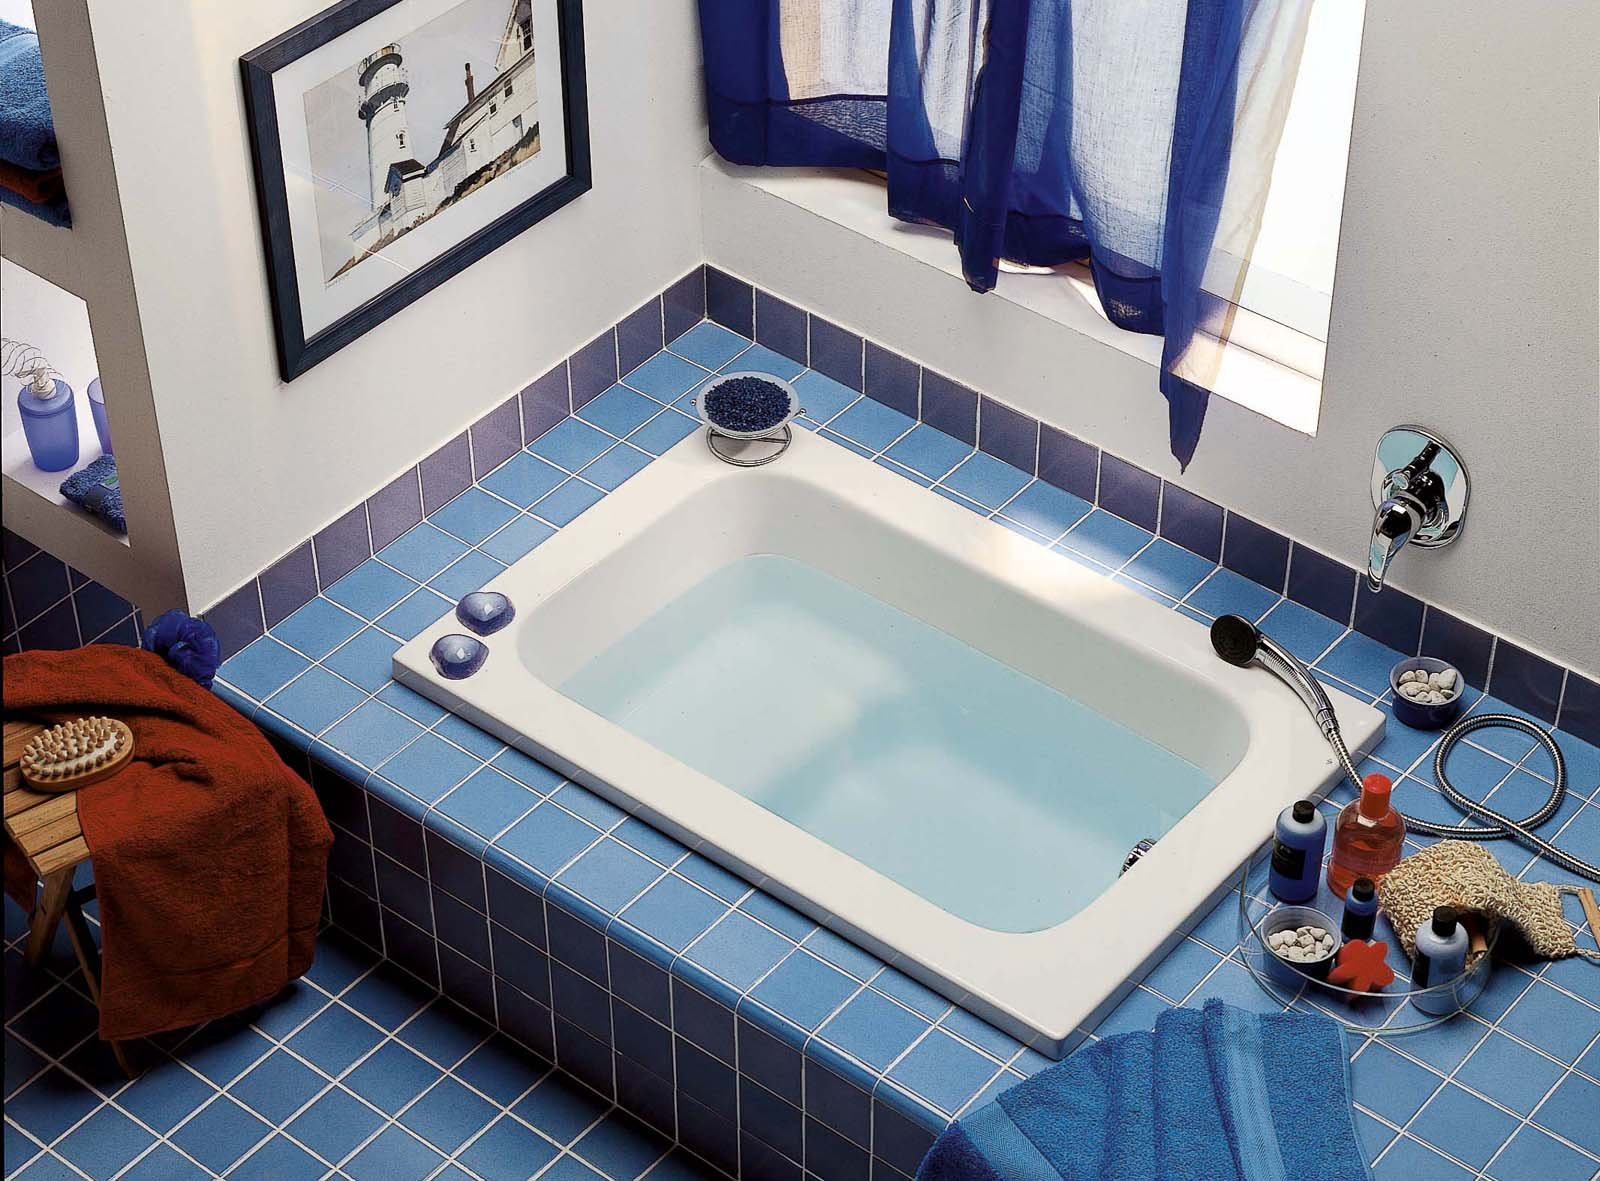 Vasca Da Bagno Grande Prezzi : Vasche da bagno piccole cose di casa